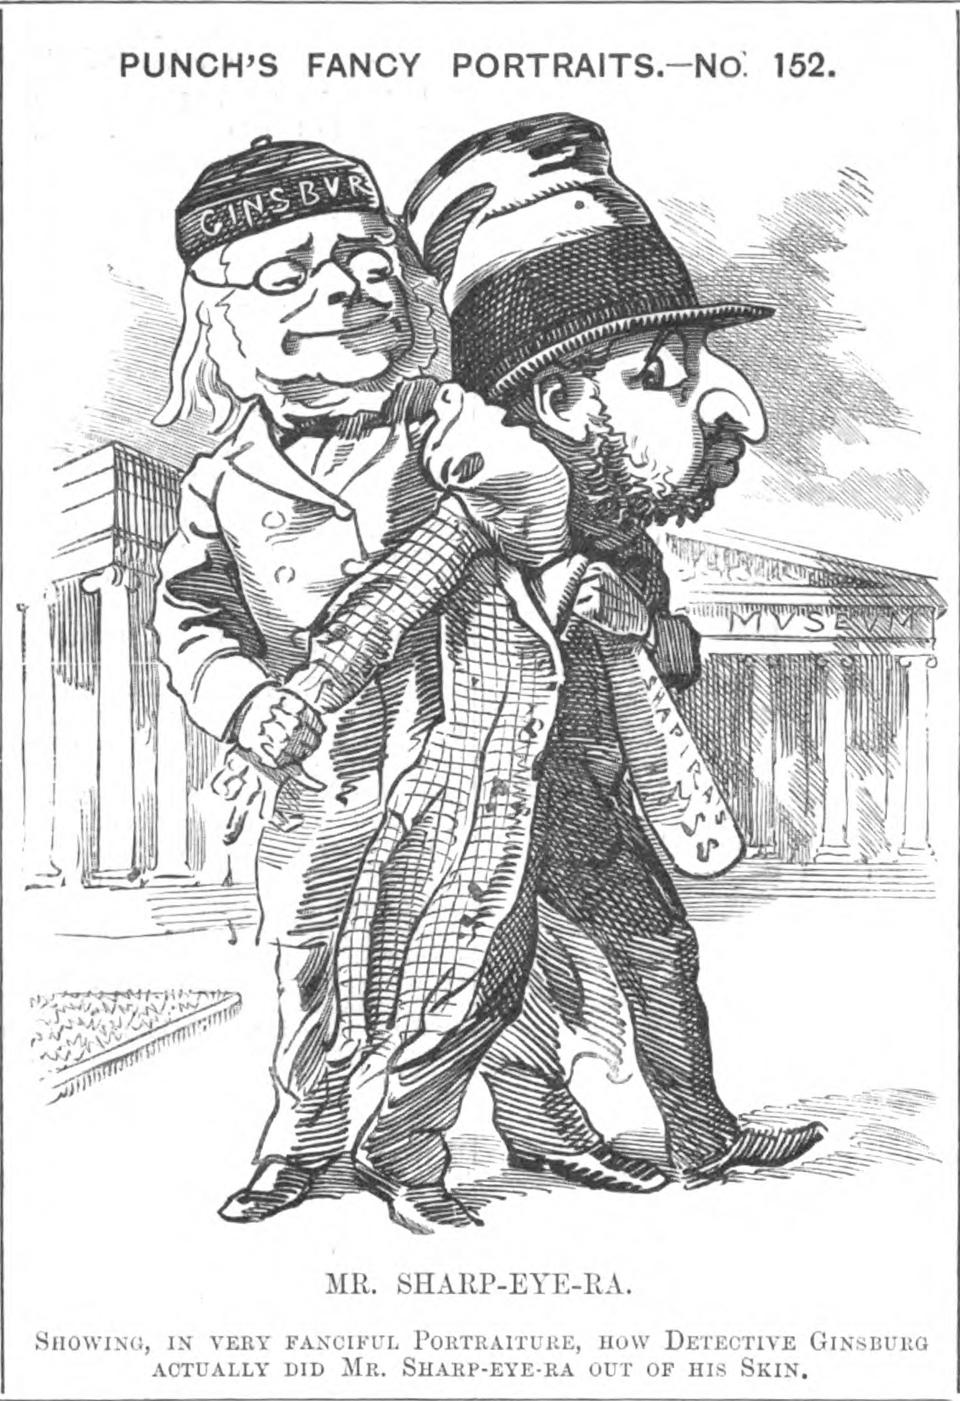 25 December 1821 Birth of David Christian Ginsburg